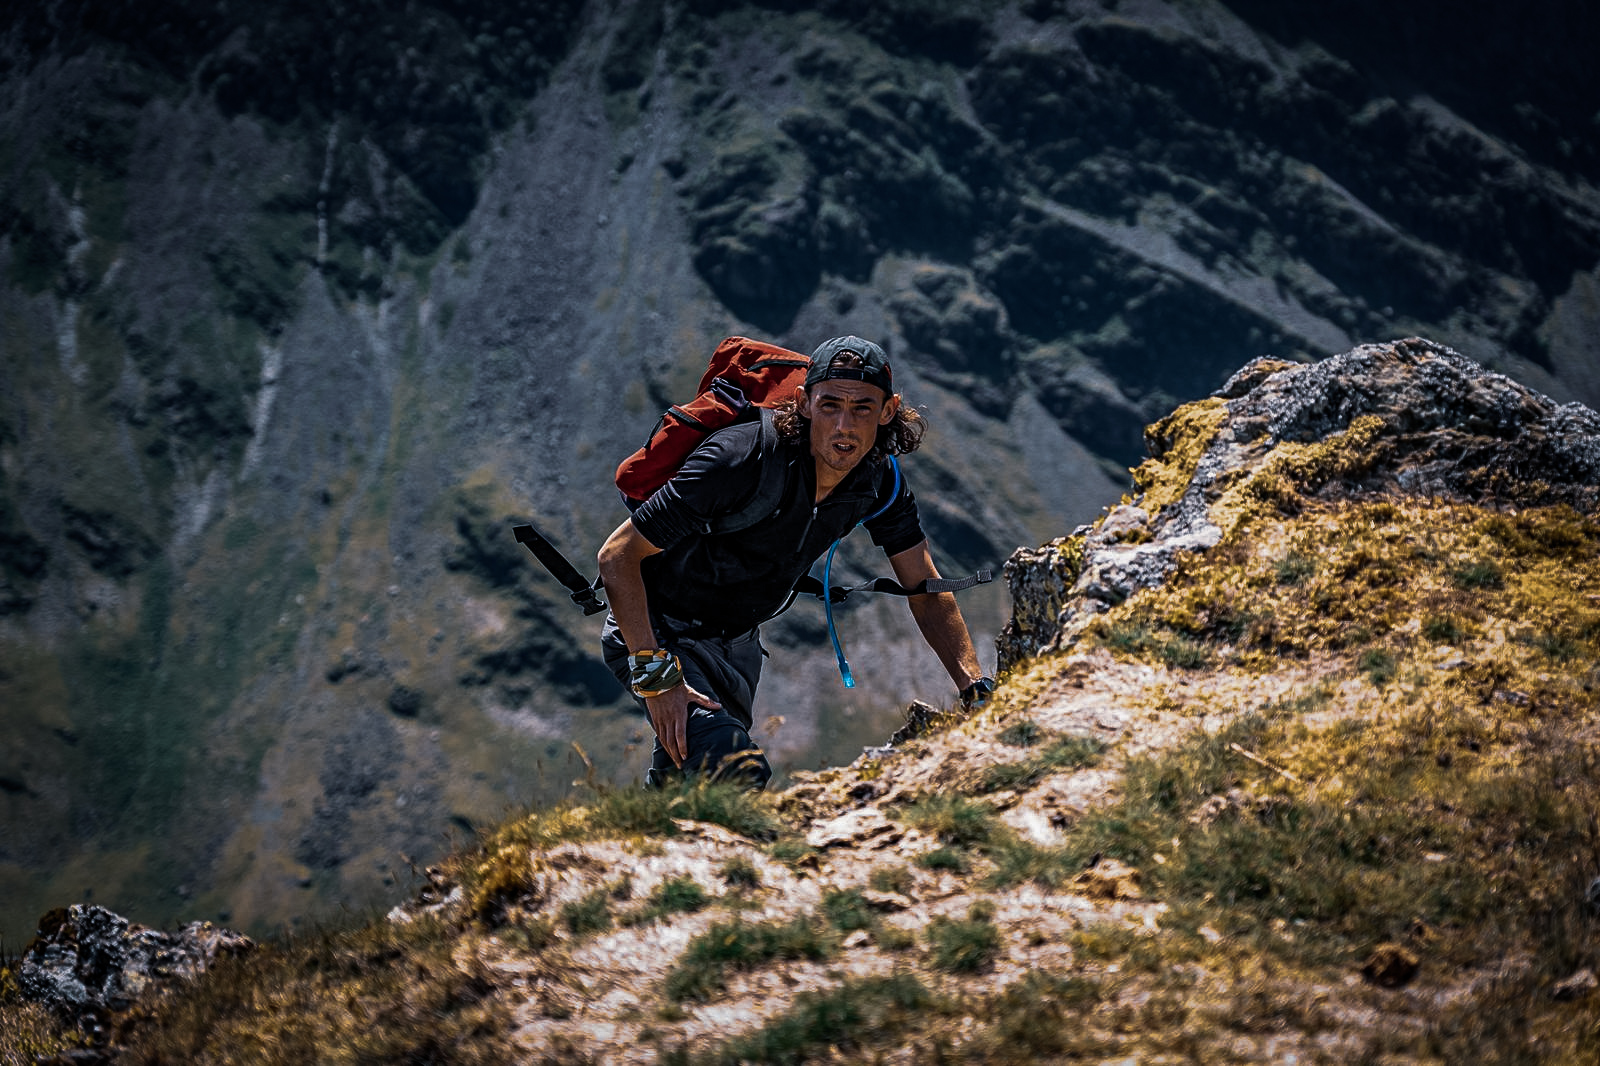 100km-thames-challenge-foz-outdoors-mind